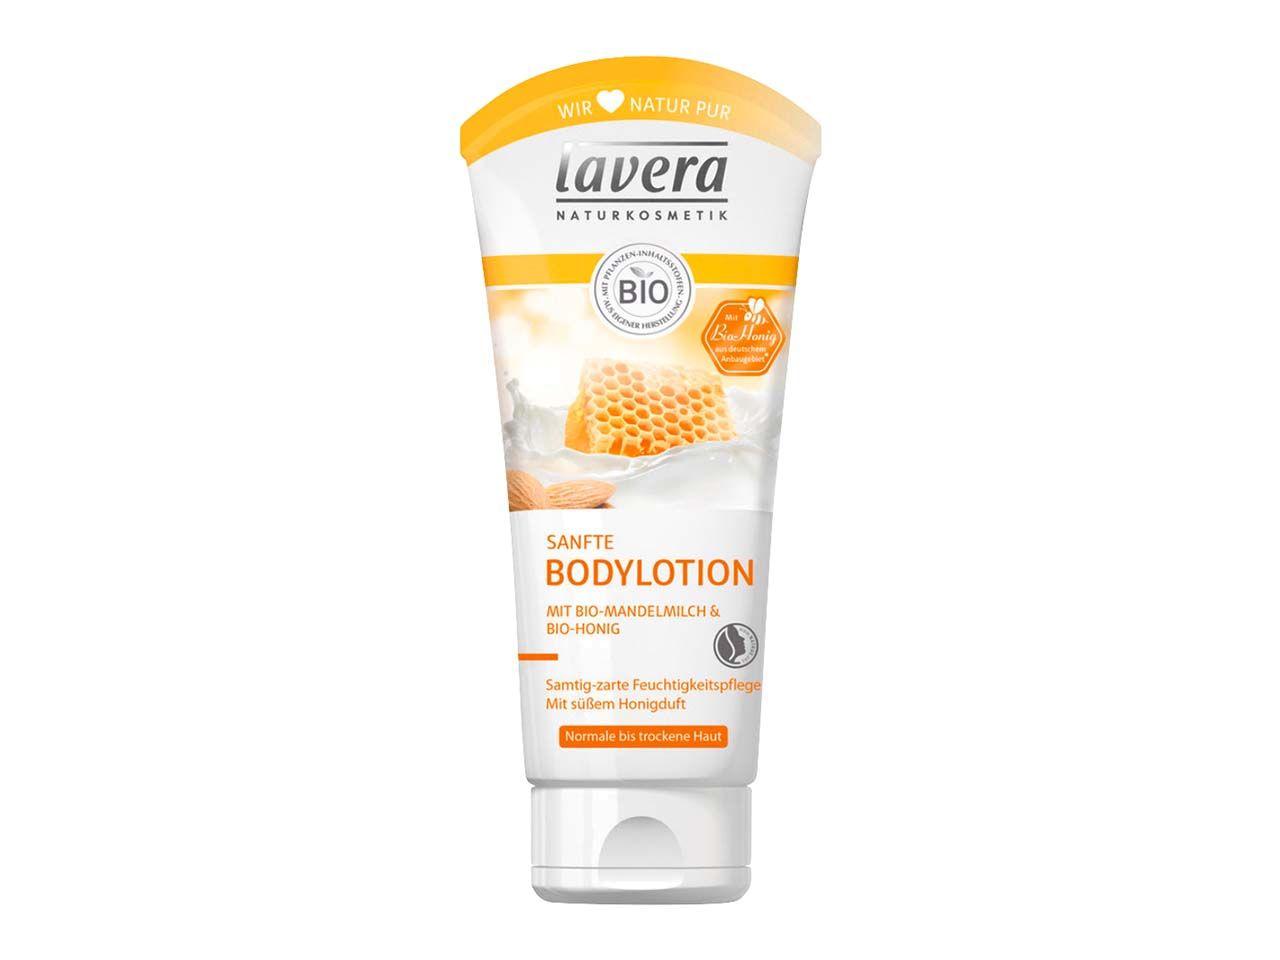 lavera Bodylotion Bio-Mandelmilch & Bio-Honig 200 ml 106238